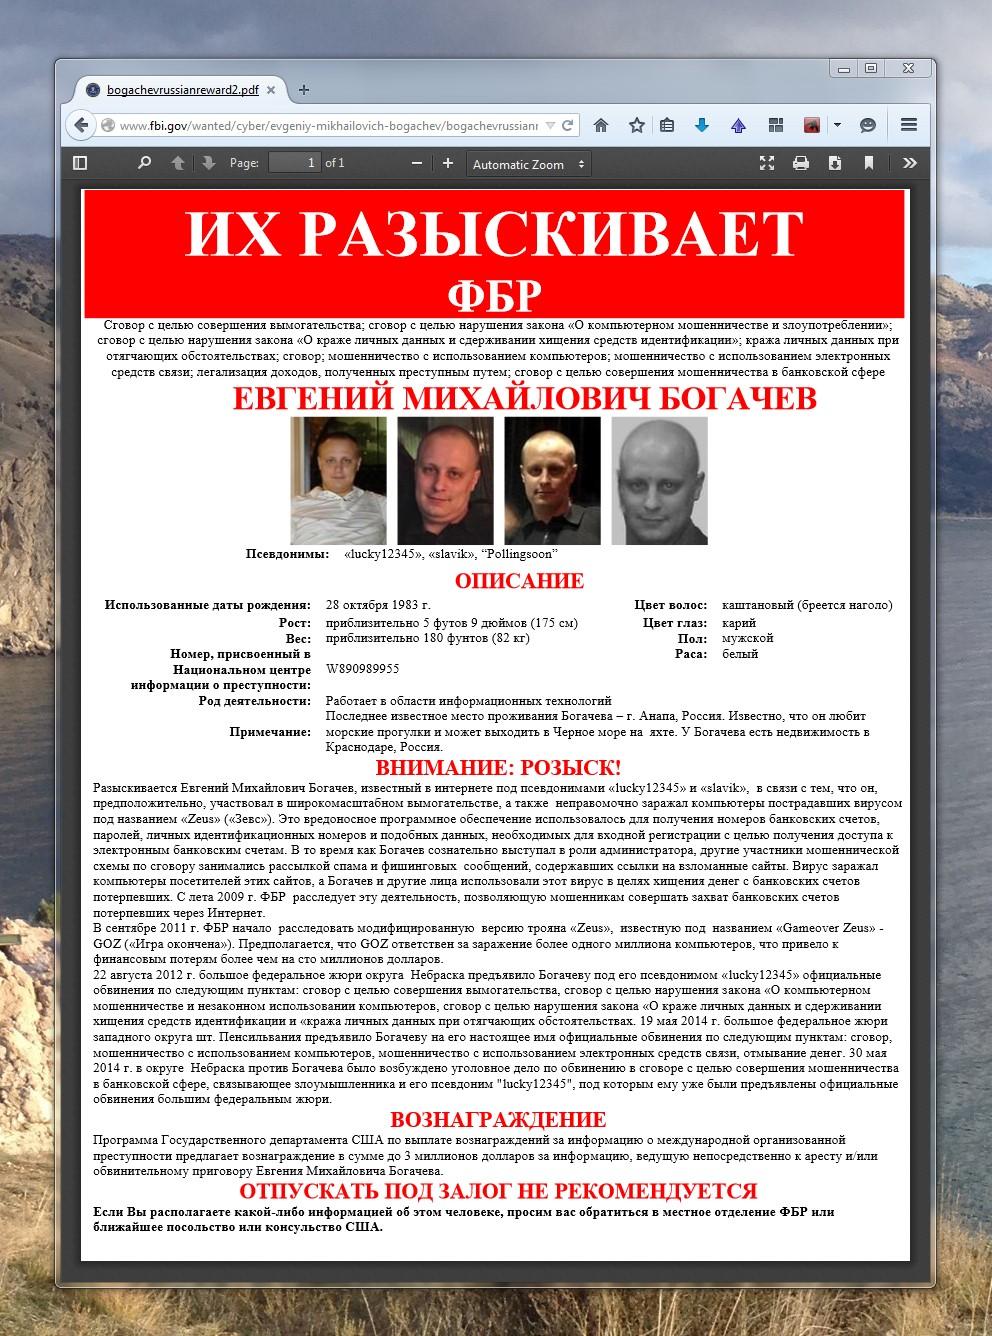 Розыск ФБР, Евгений Михайлович Богачев